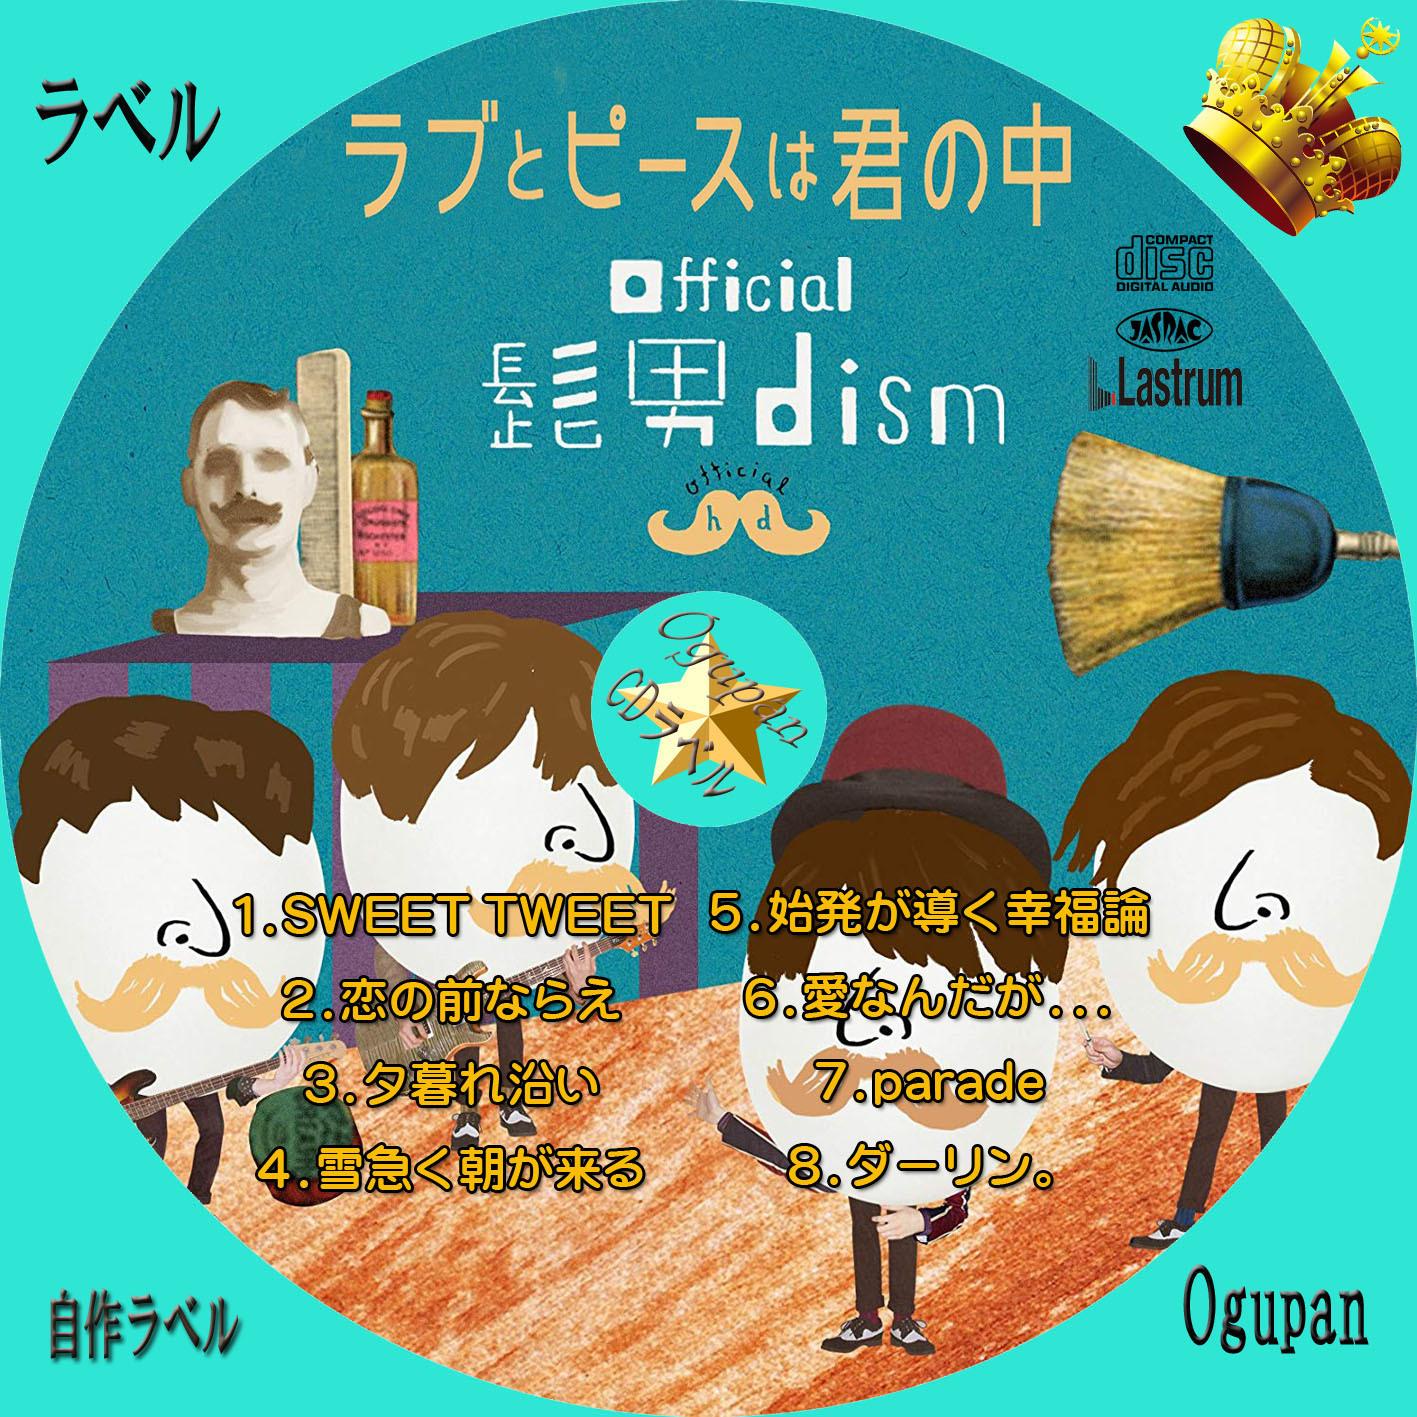 official 髭 男 dism トラベラー